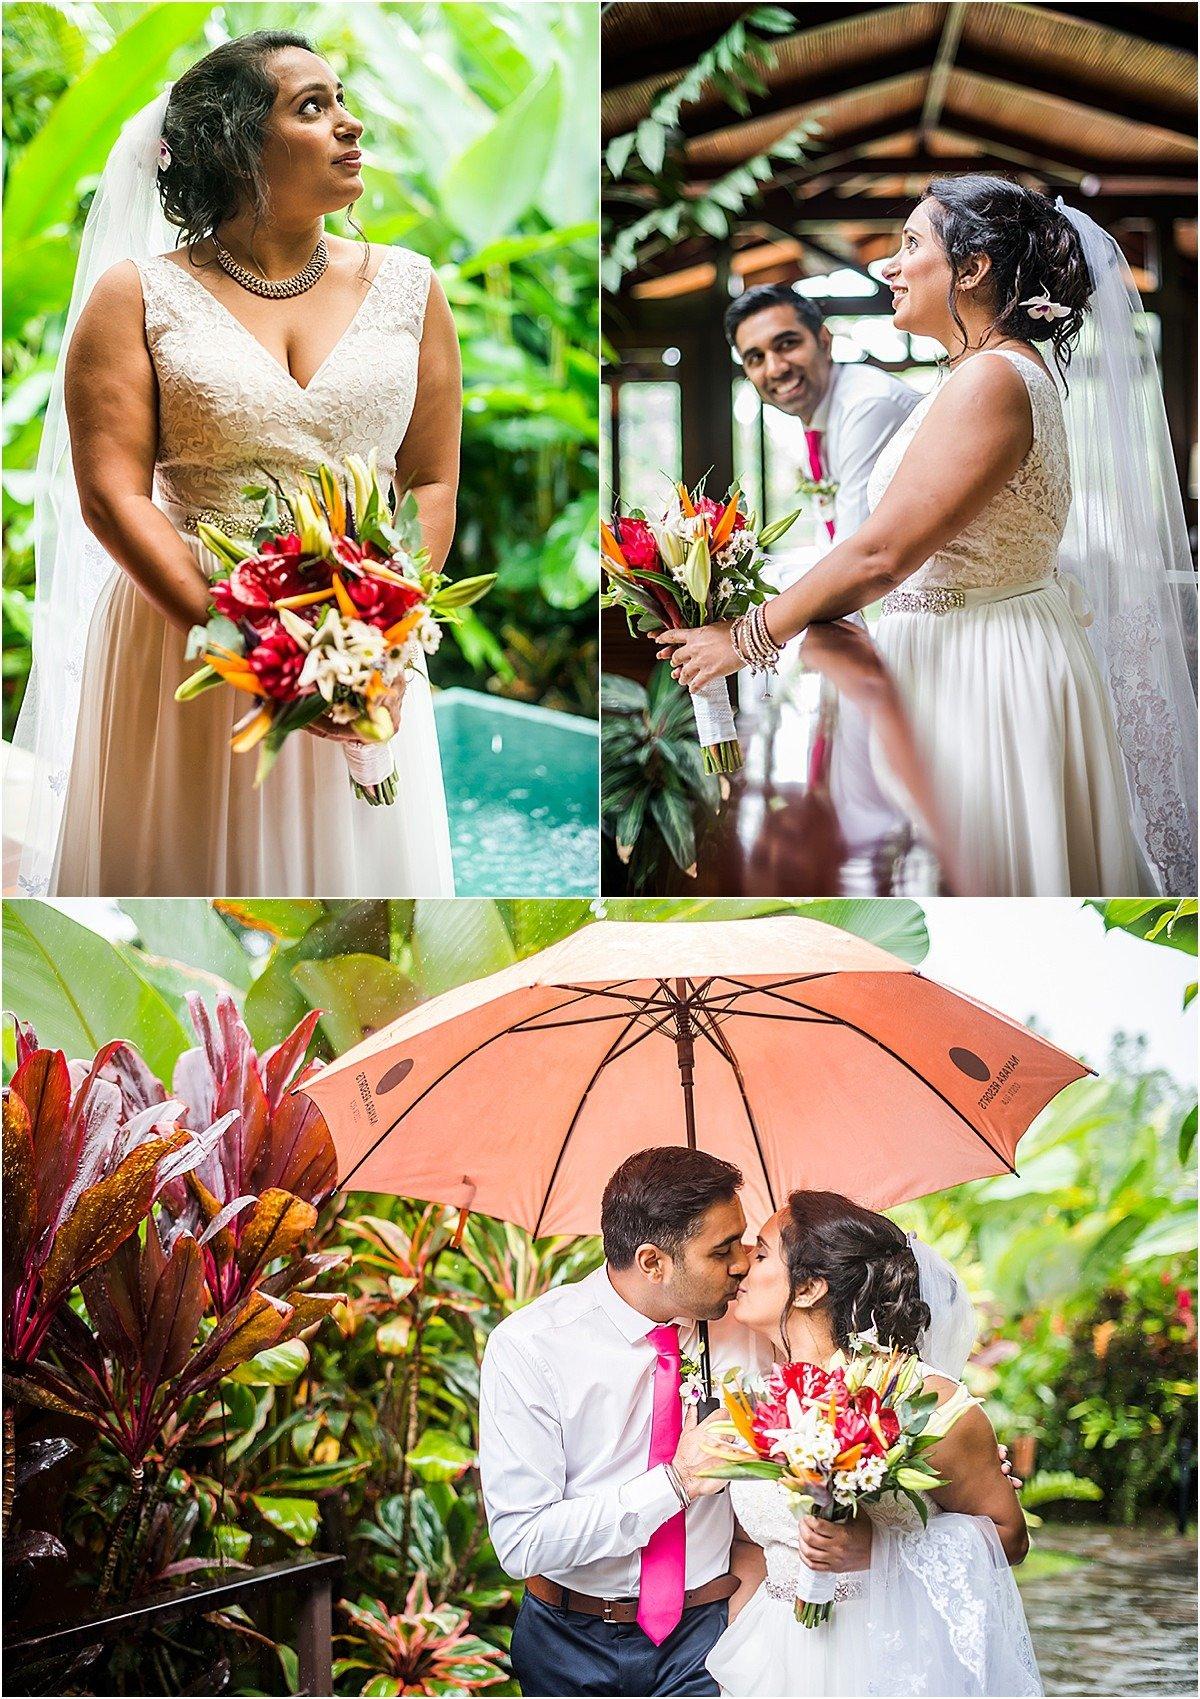 happy couple in the rain under an umbrella